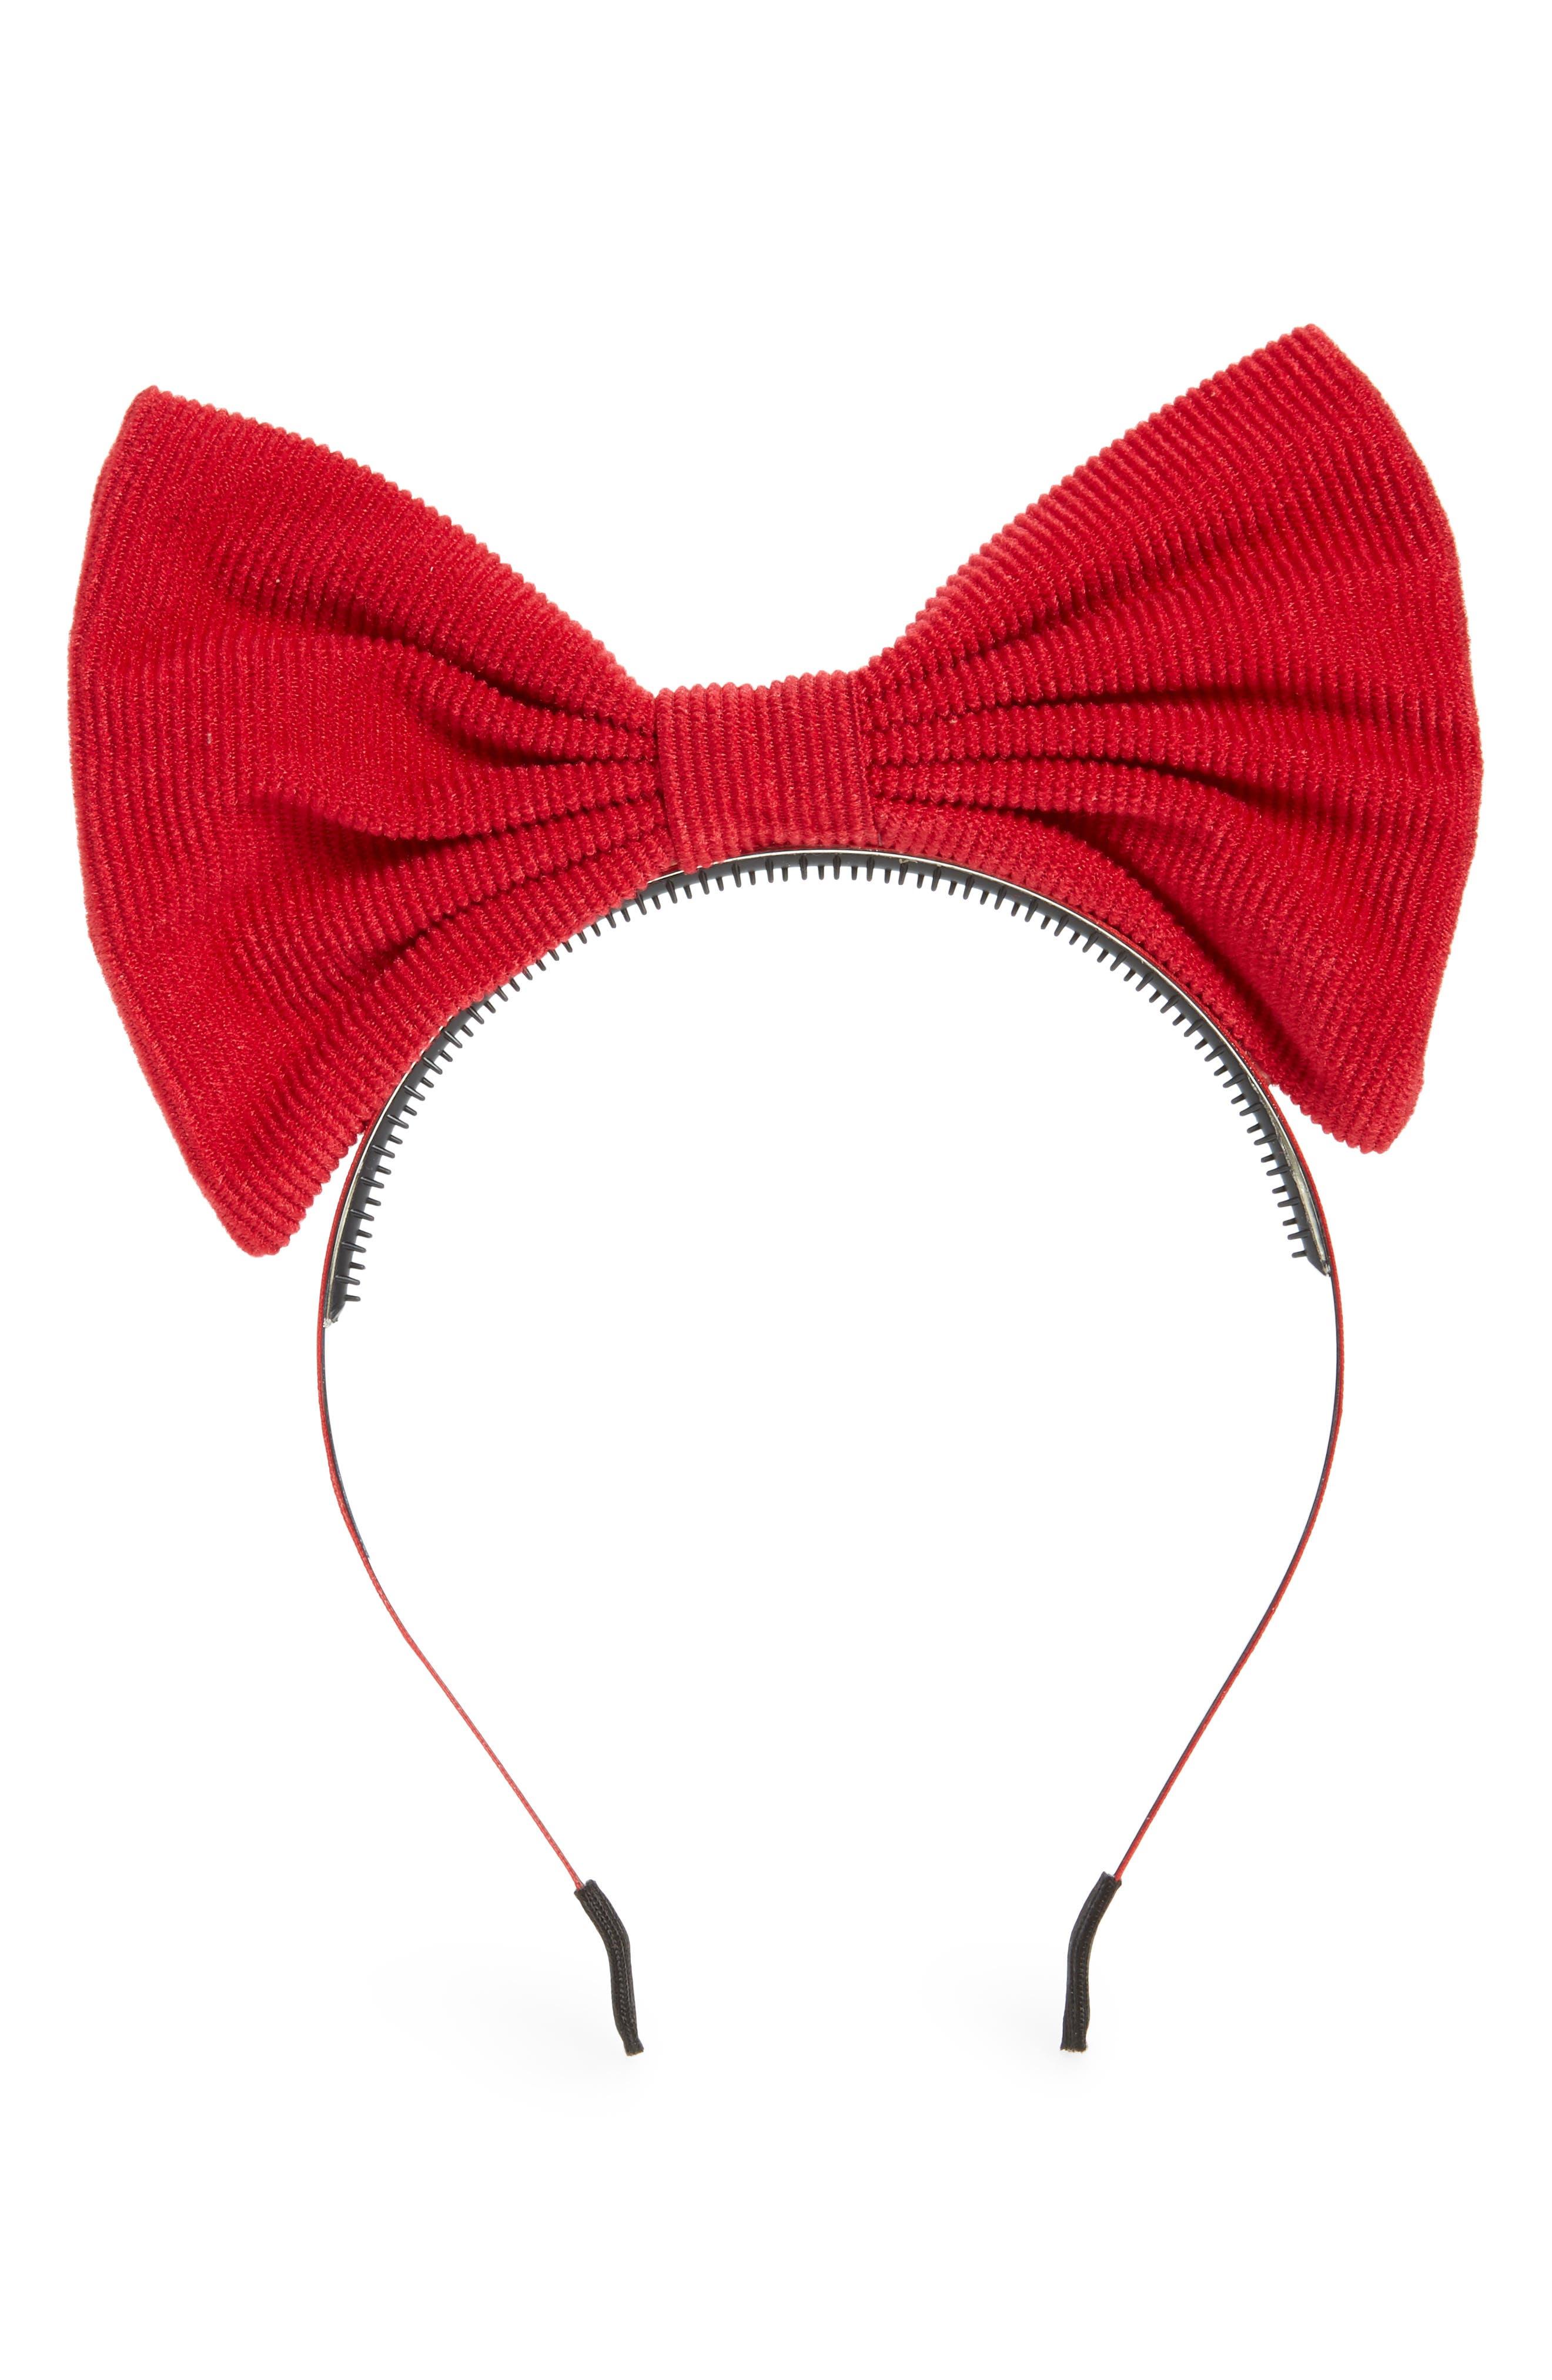 Main Image - Manière Corduroy Bow Headband (Girls)